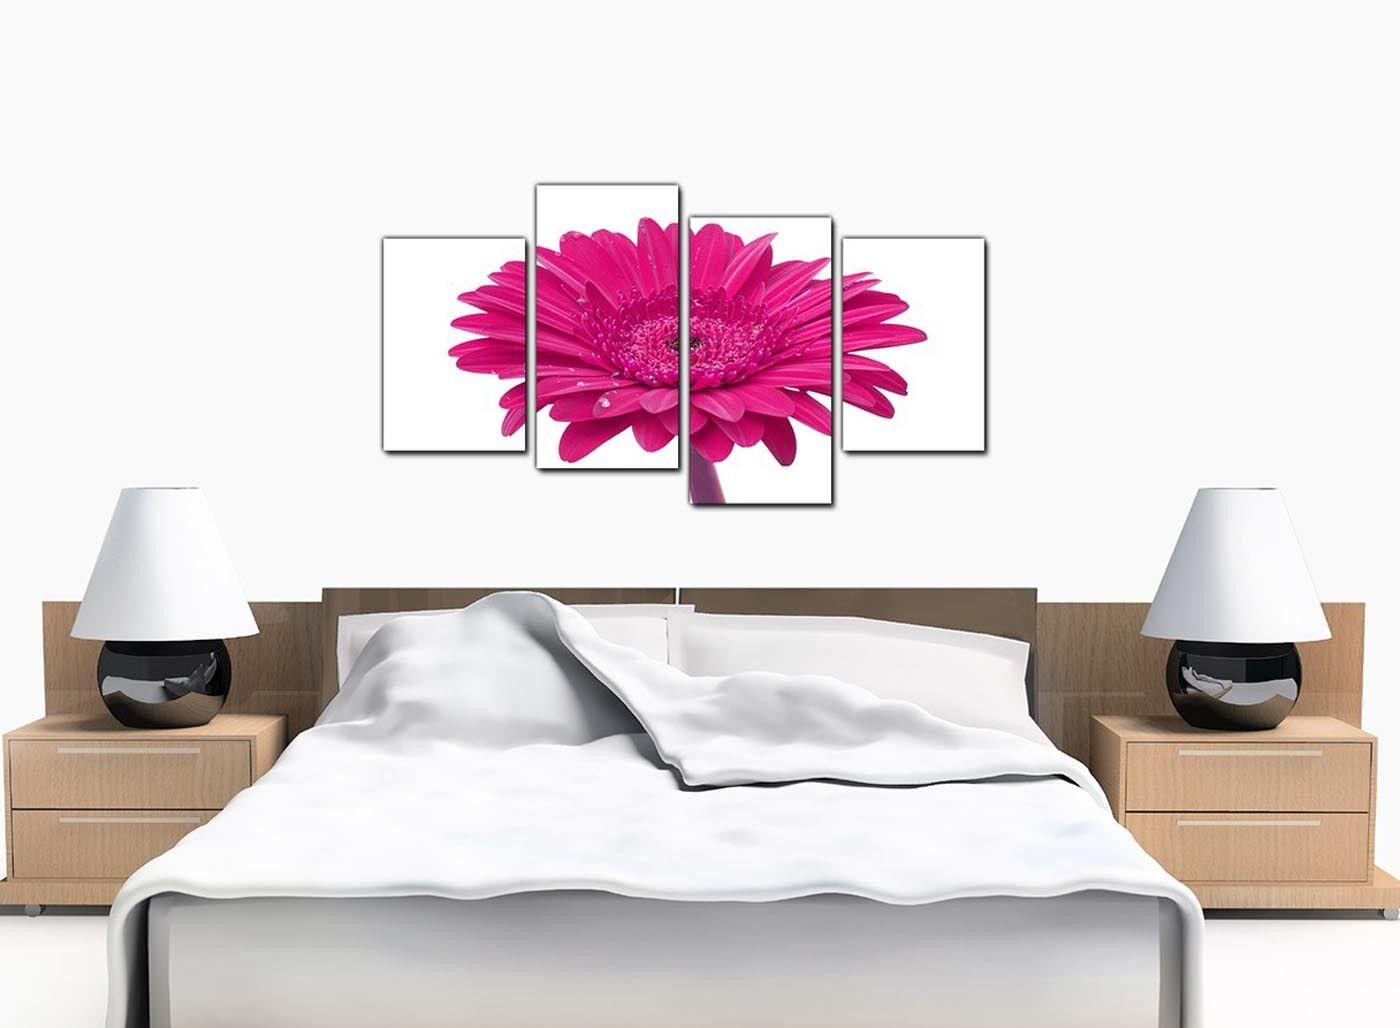 Large Rosa Gerbera Daisy VW Floral Canvas Pictures XL XL XL Prints Art 4099 842e87